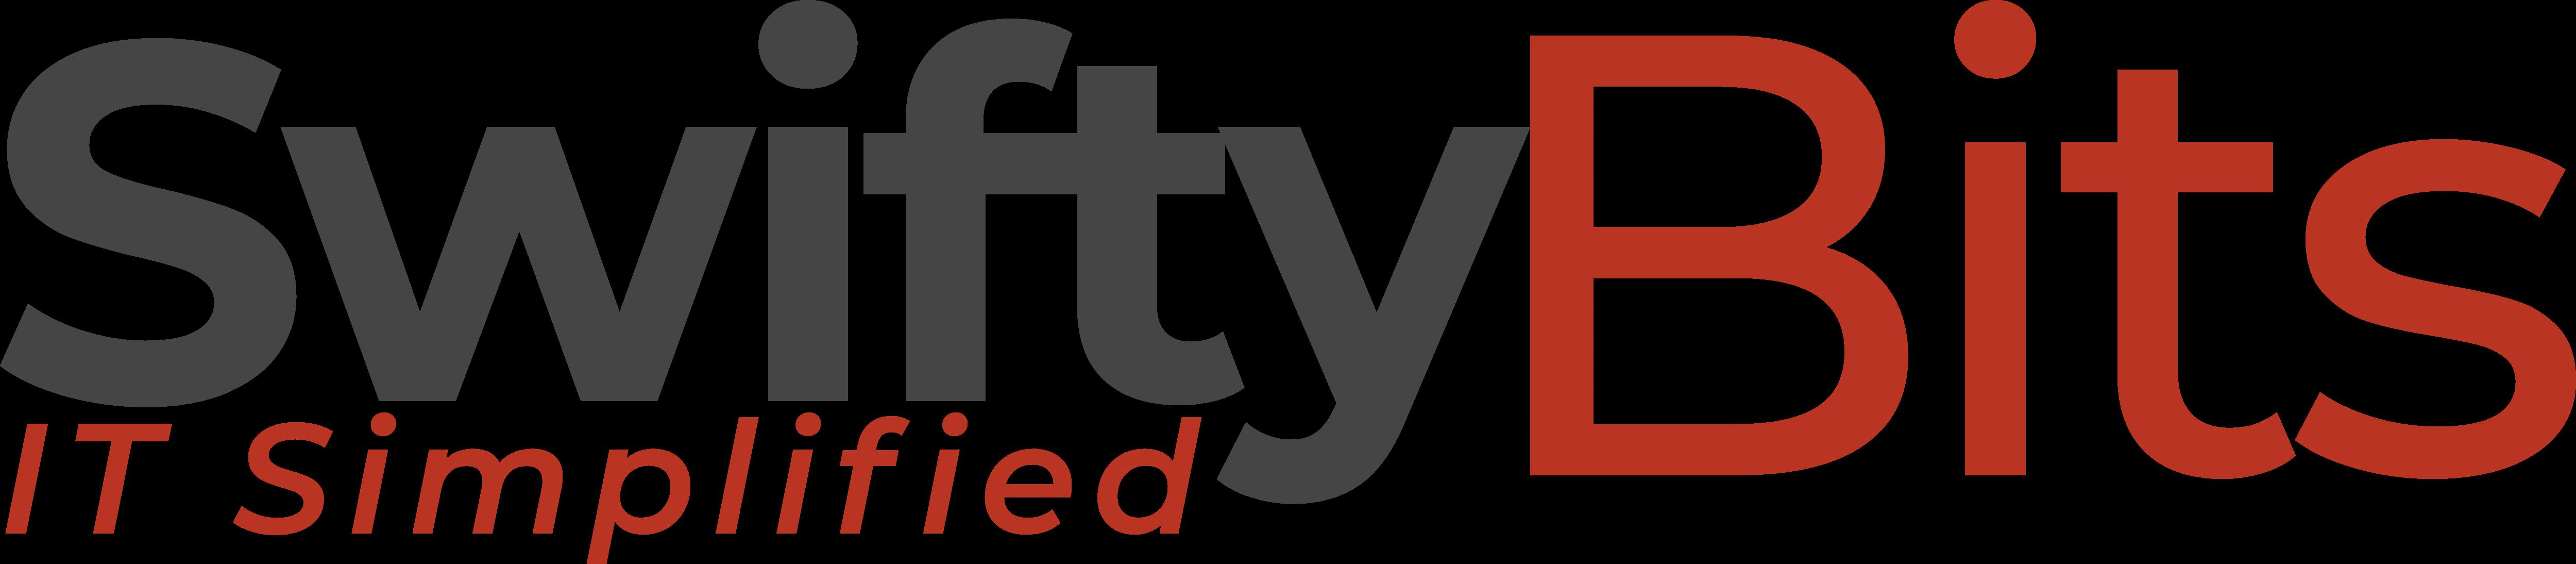 SwiftyBits